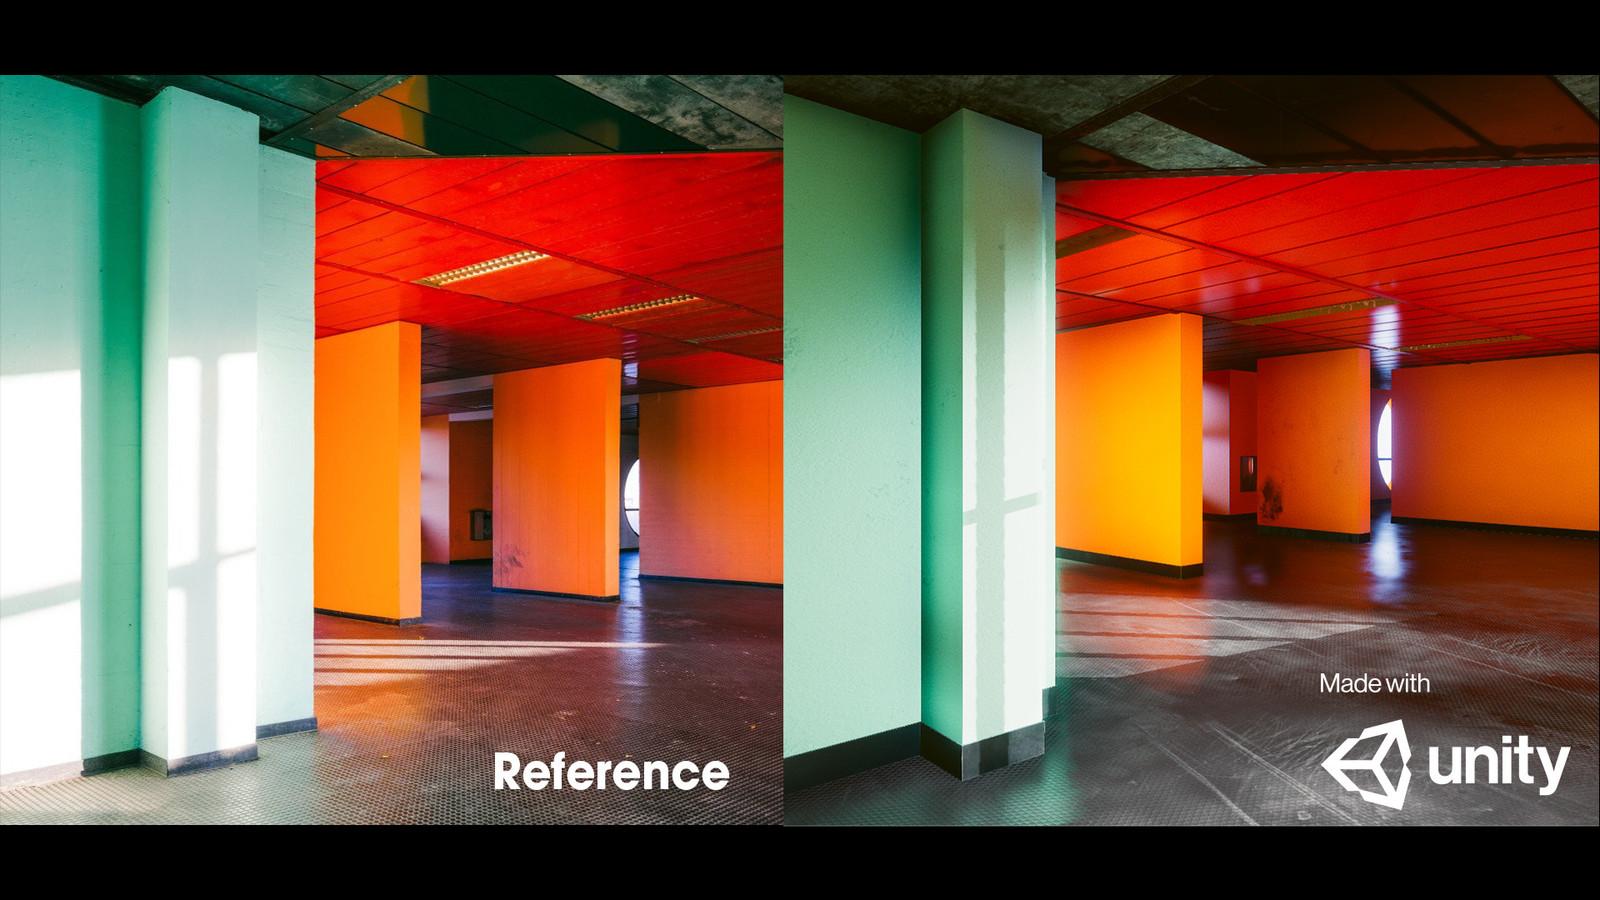 Lighting Study reference match